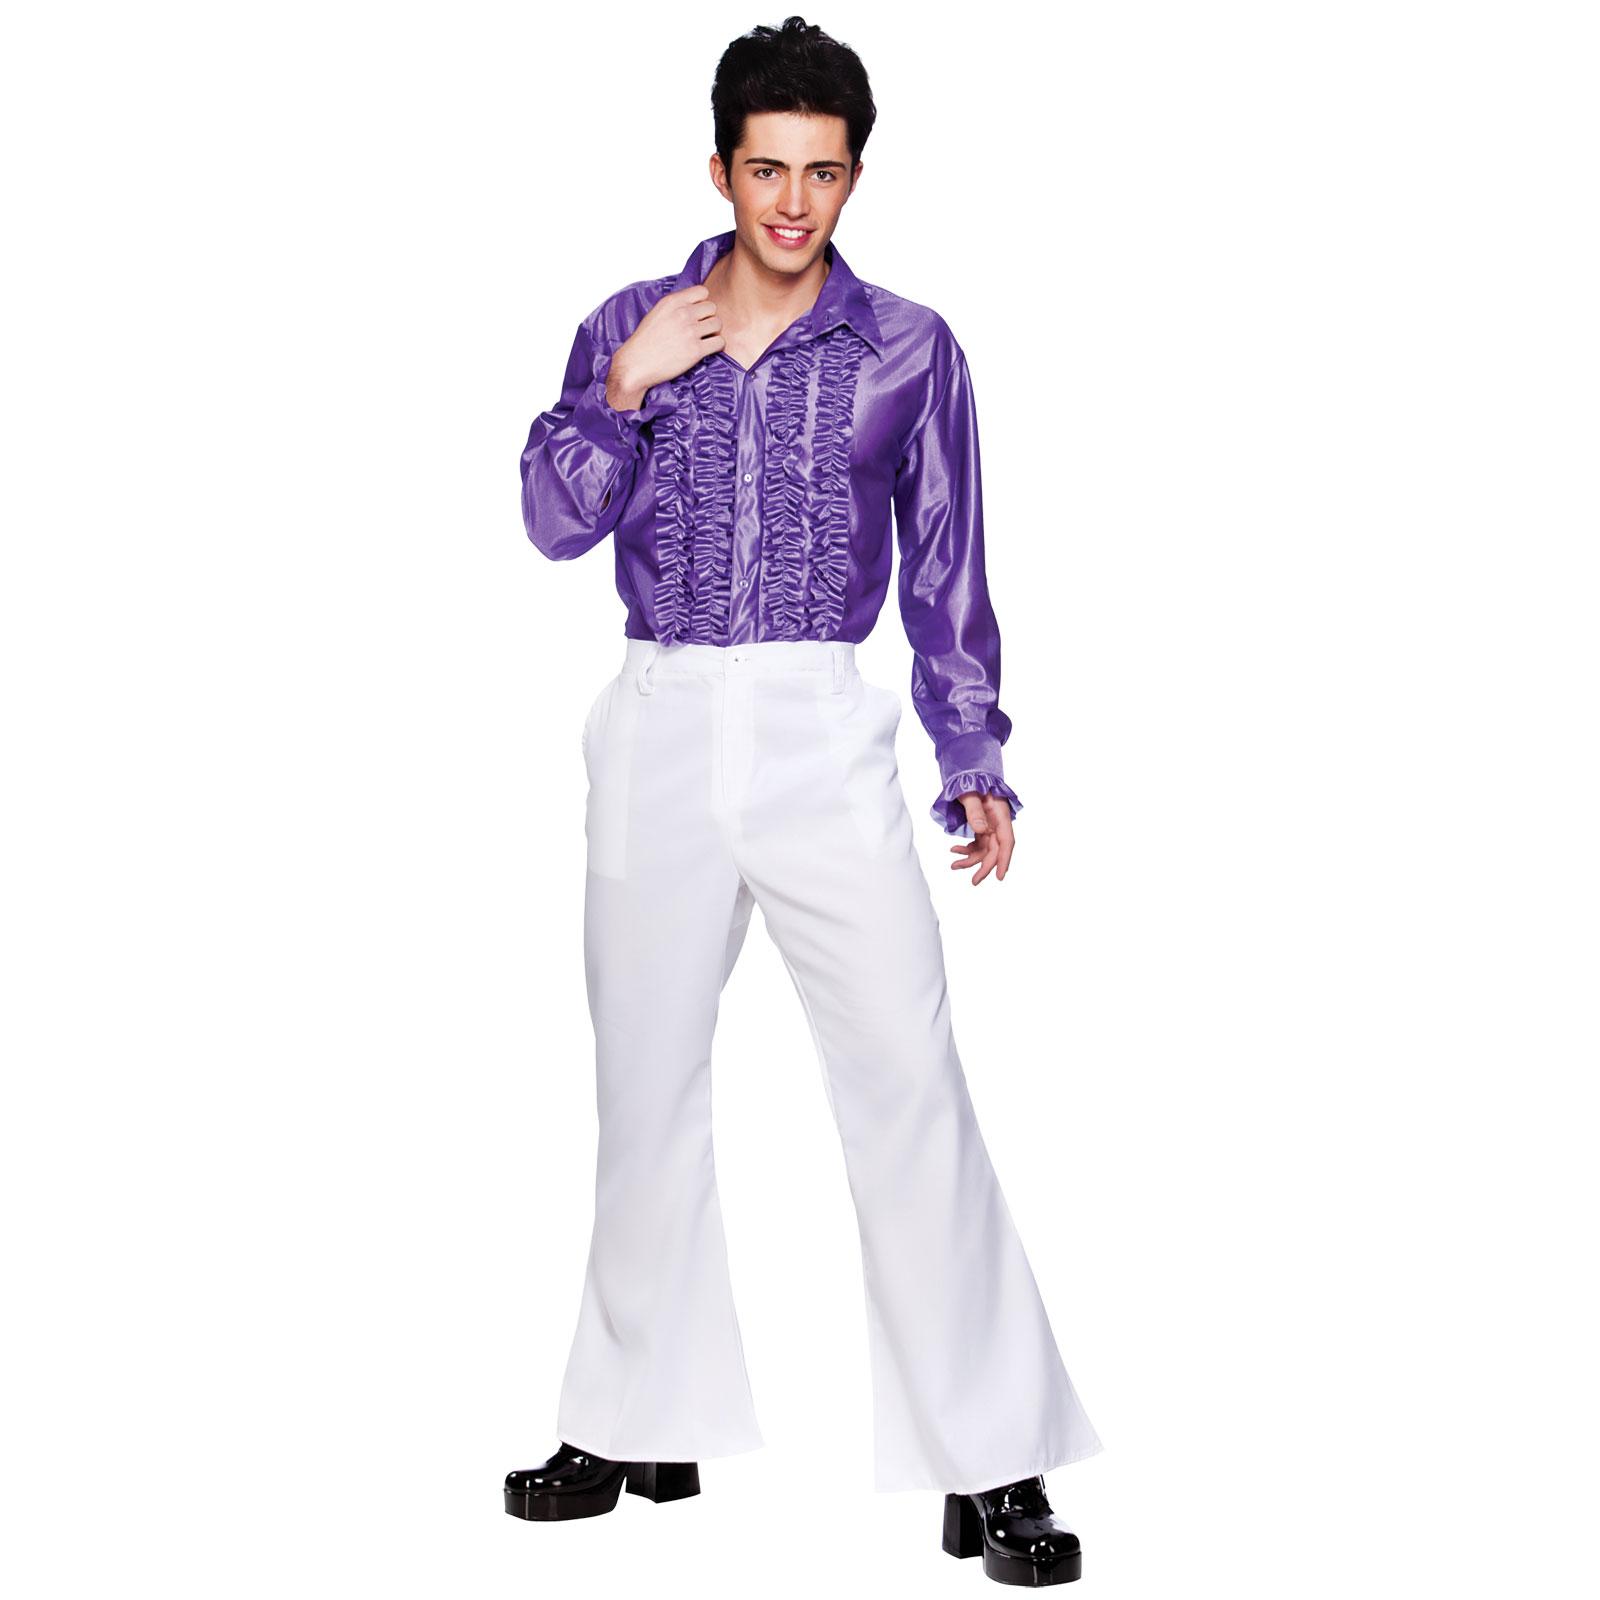 Disco fashion clothes